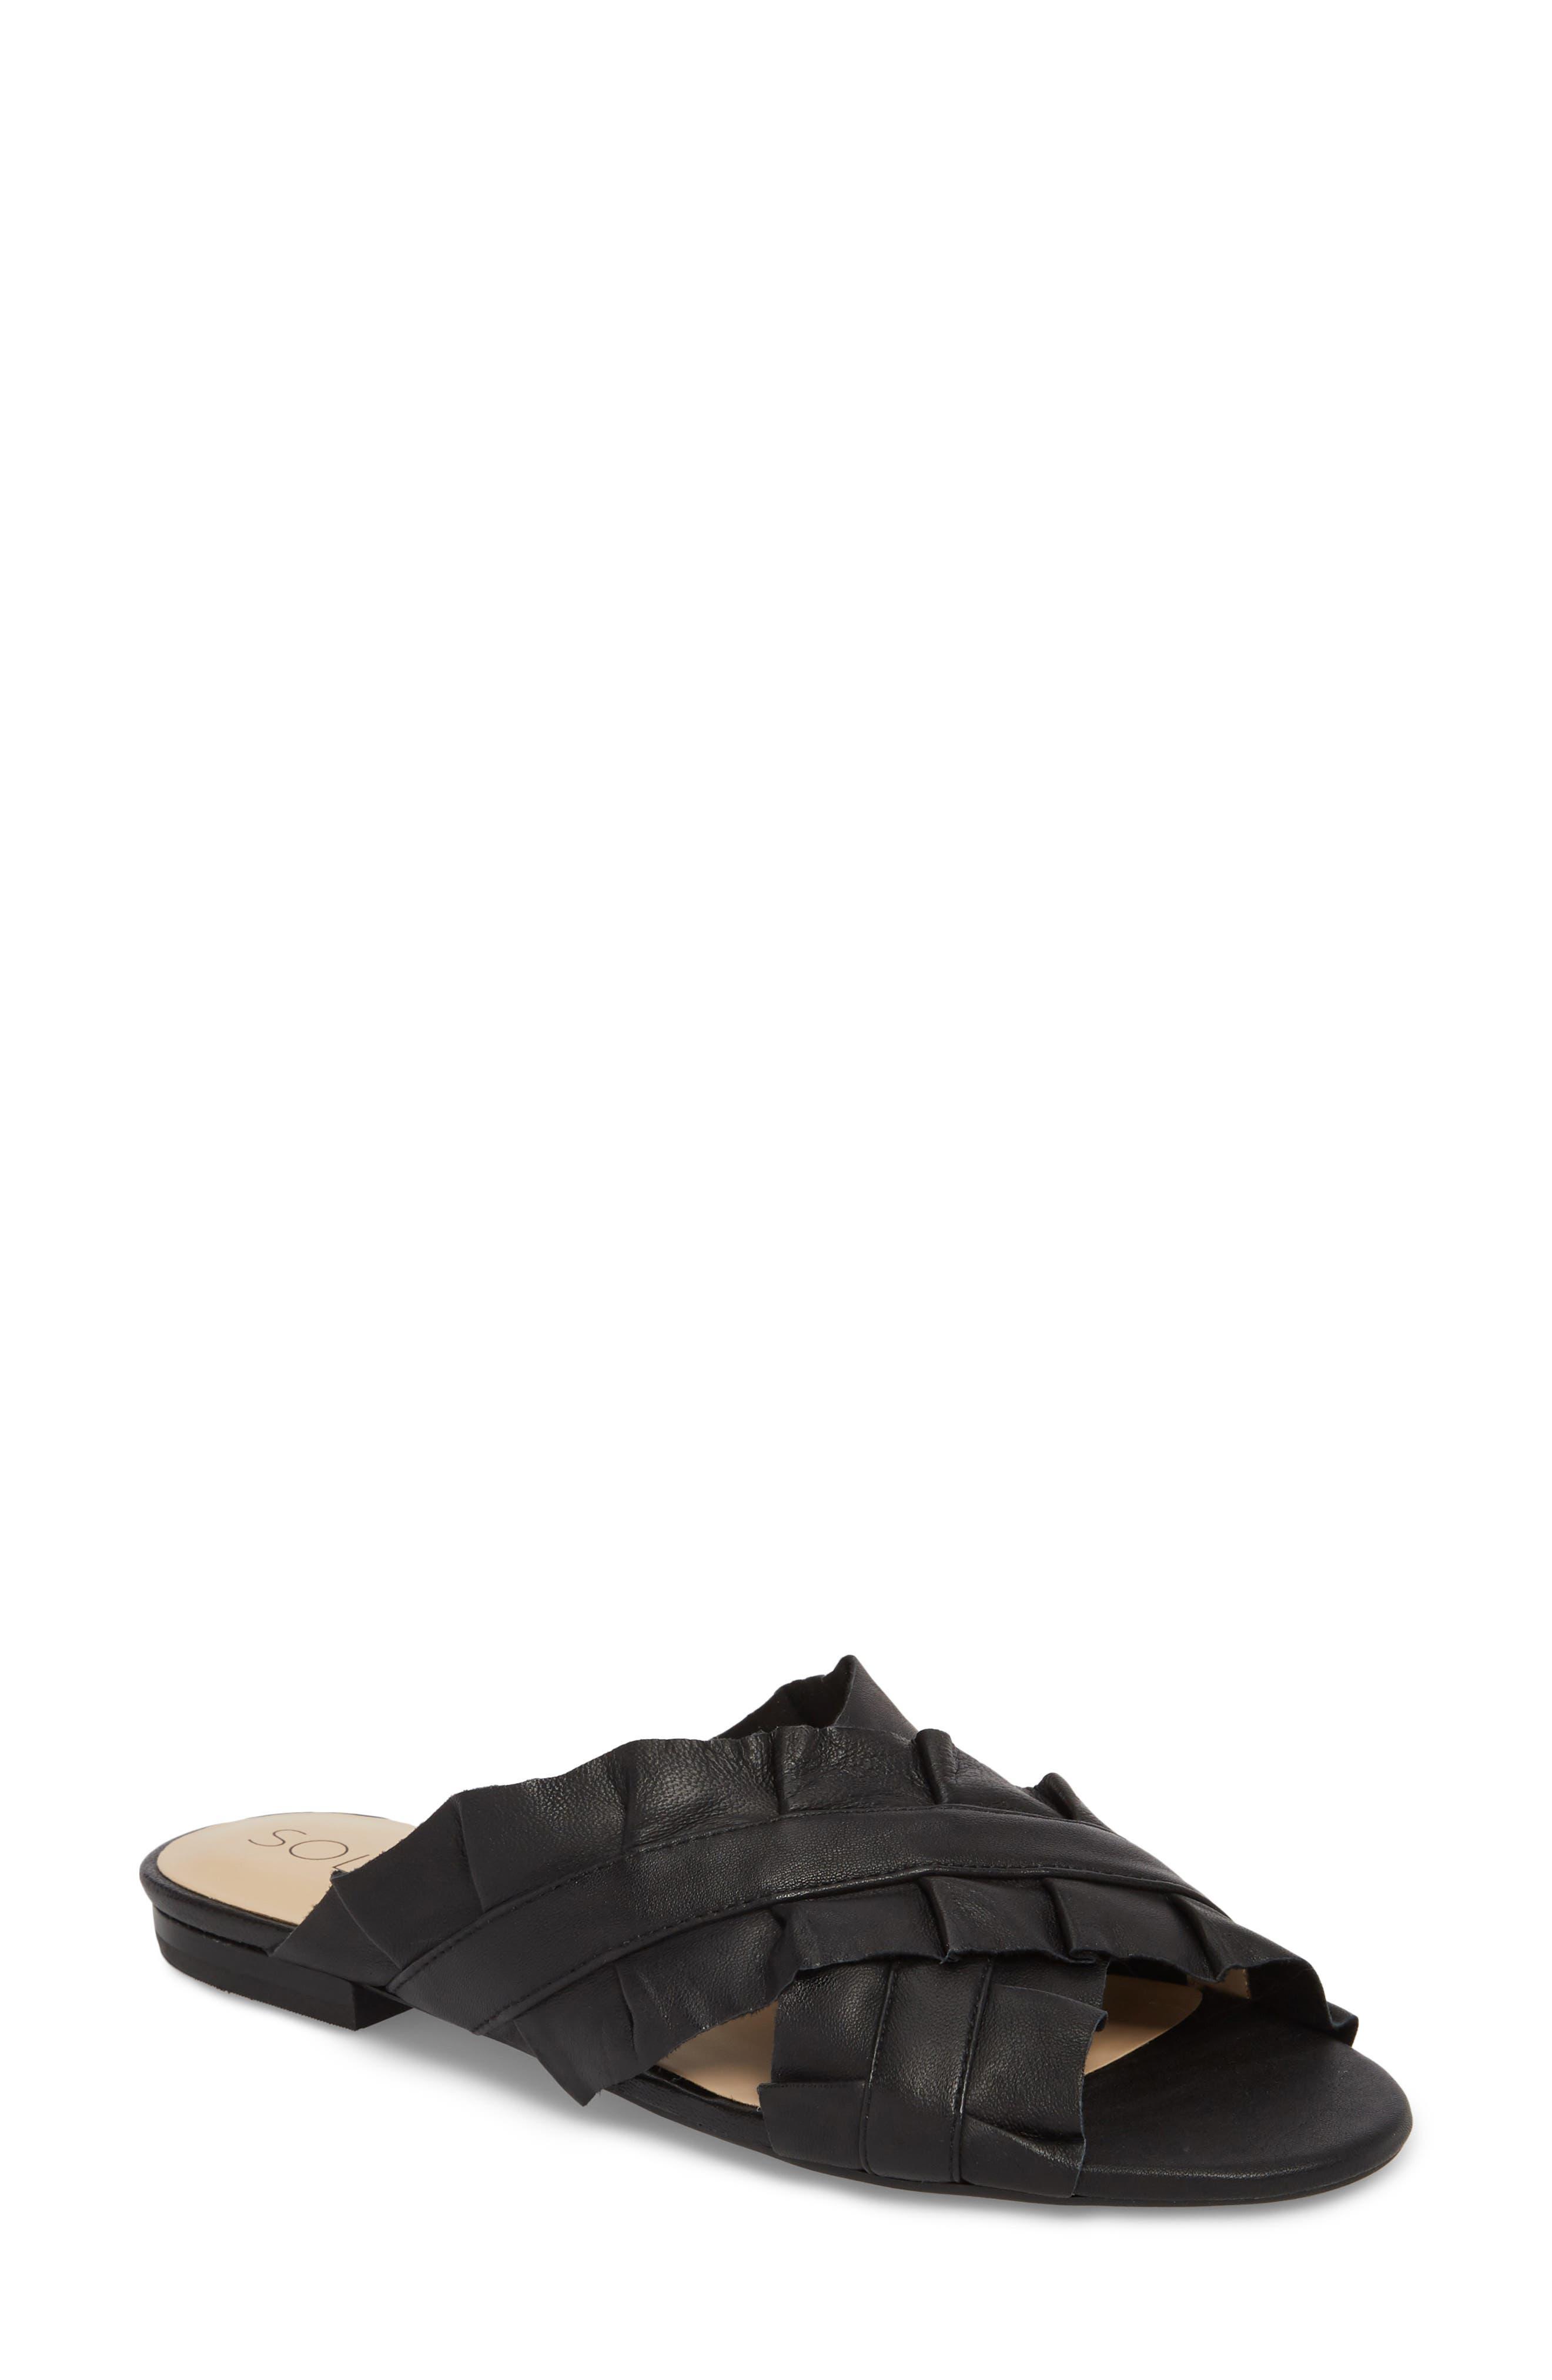 SOLE SOCIETY,                             Mandi Slide Sandal,                             Main thumbnail 1, color,                             BLACK